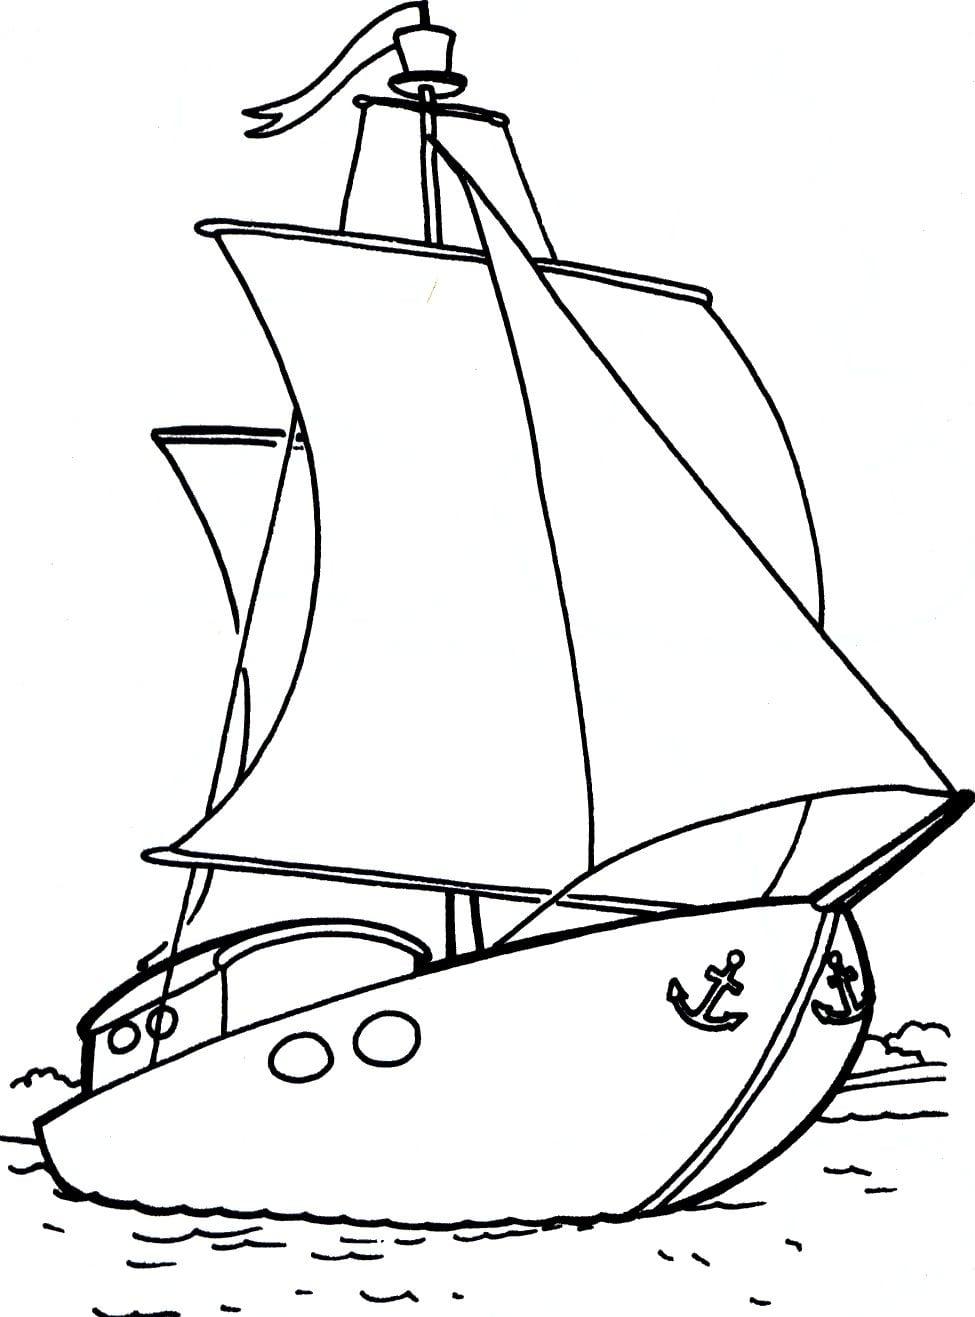 Desenhos de barco para colorir